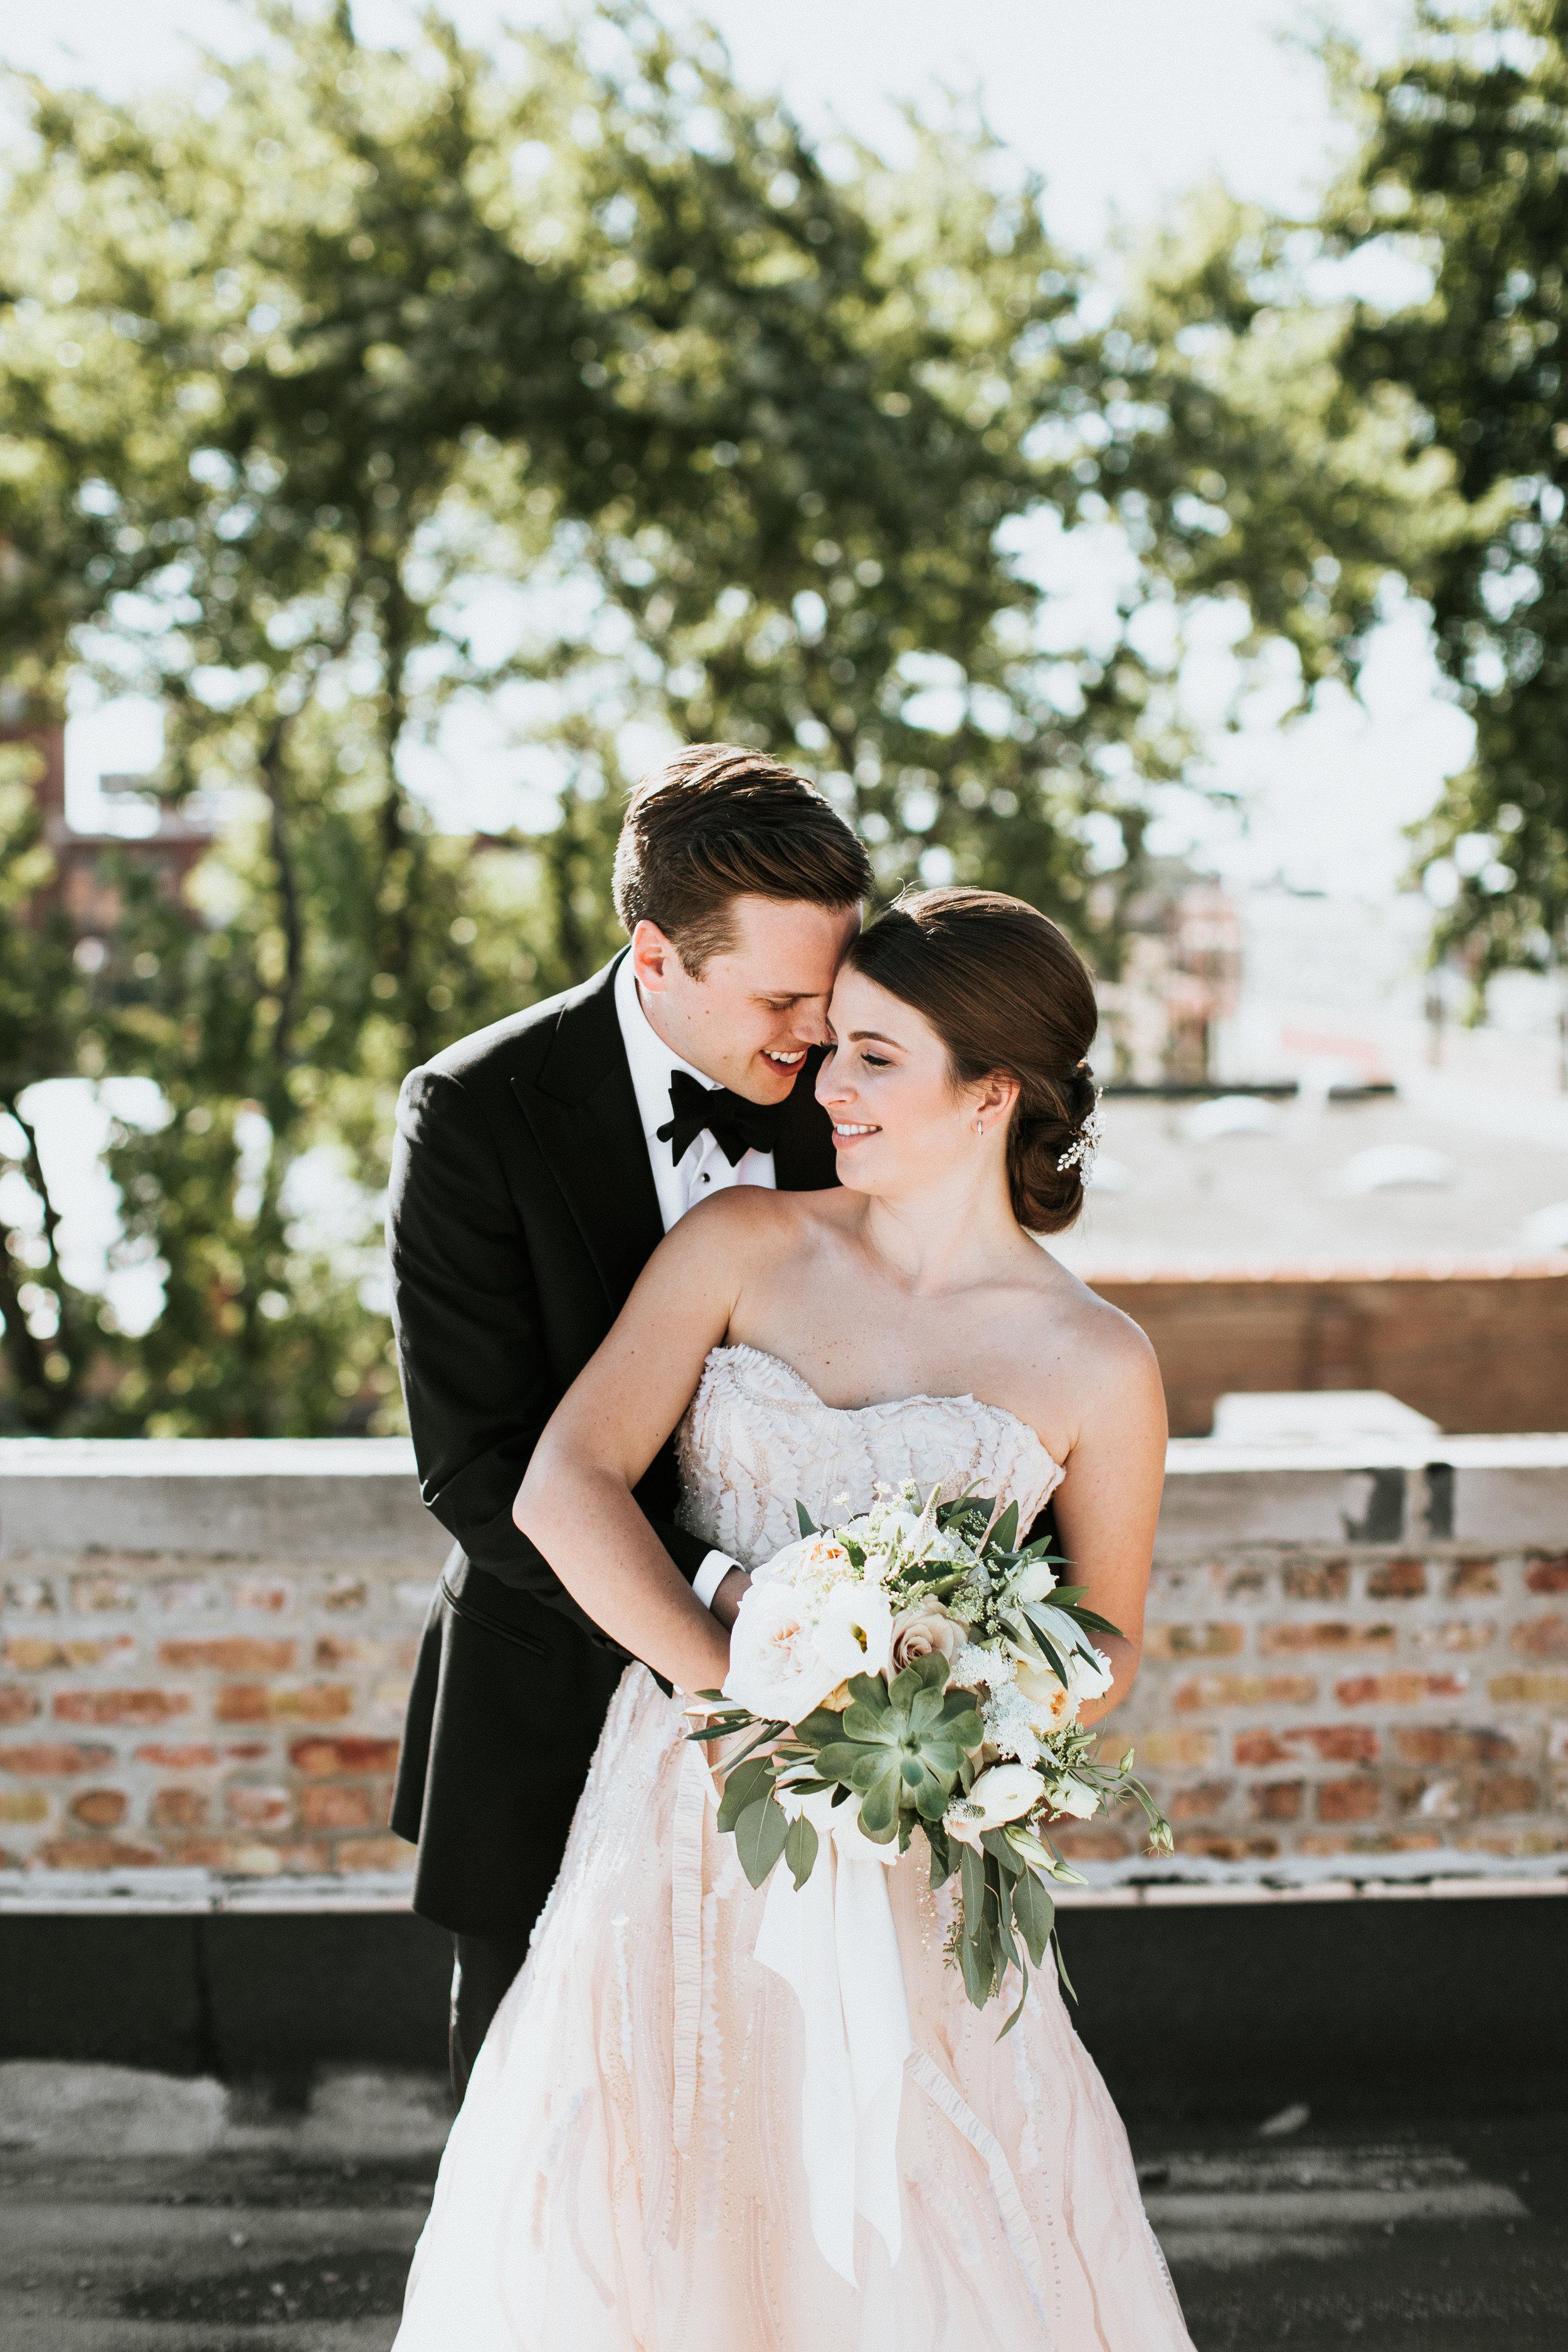 LJ-Wedding-(TODD_JAMES_PHOTOGRAPHY)-18.jpg